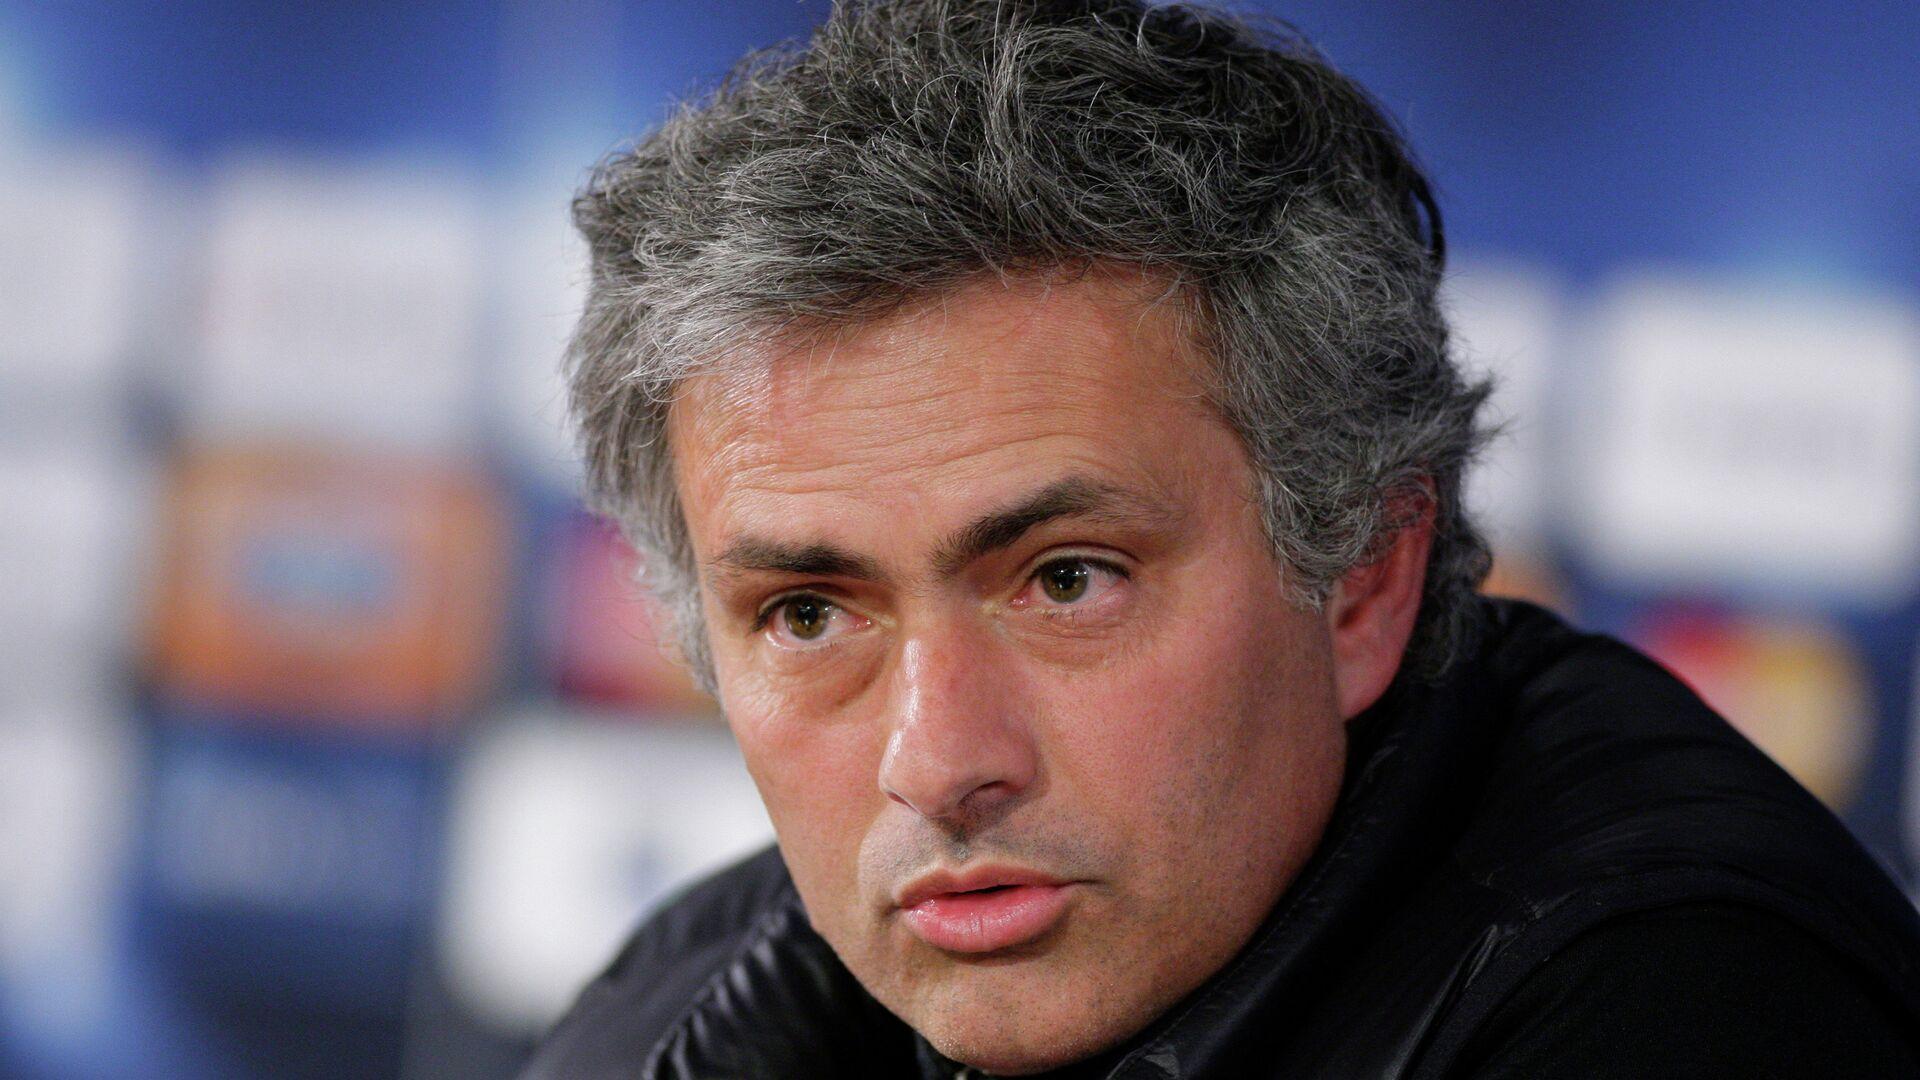 José Mourinho, el exentrenador del equipo de fútbol Tottenham Hotspur - Sputnik Mundo, 1920, 19.04.2021